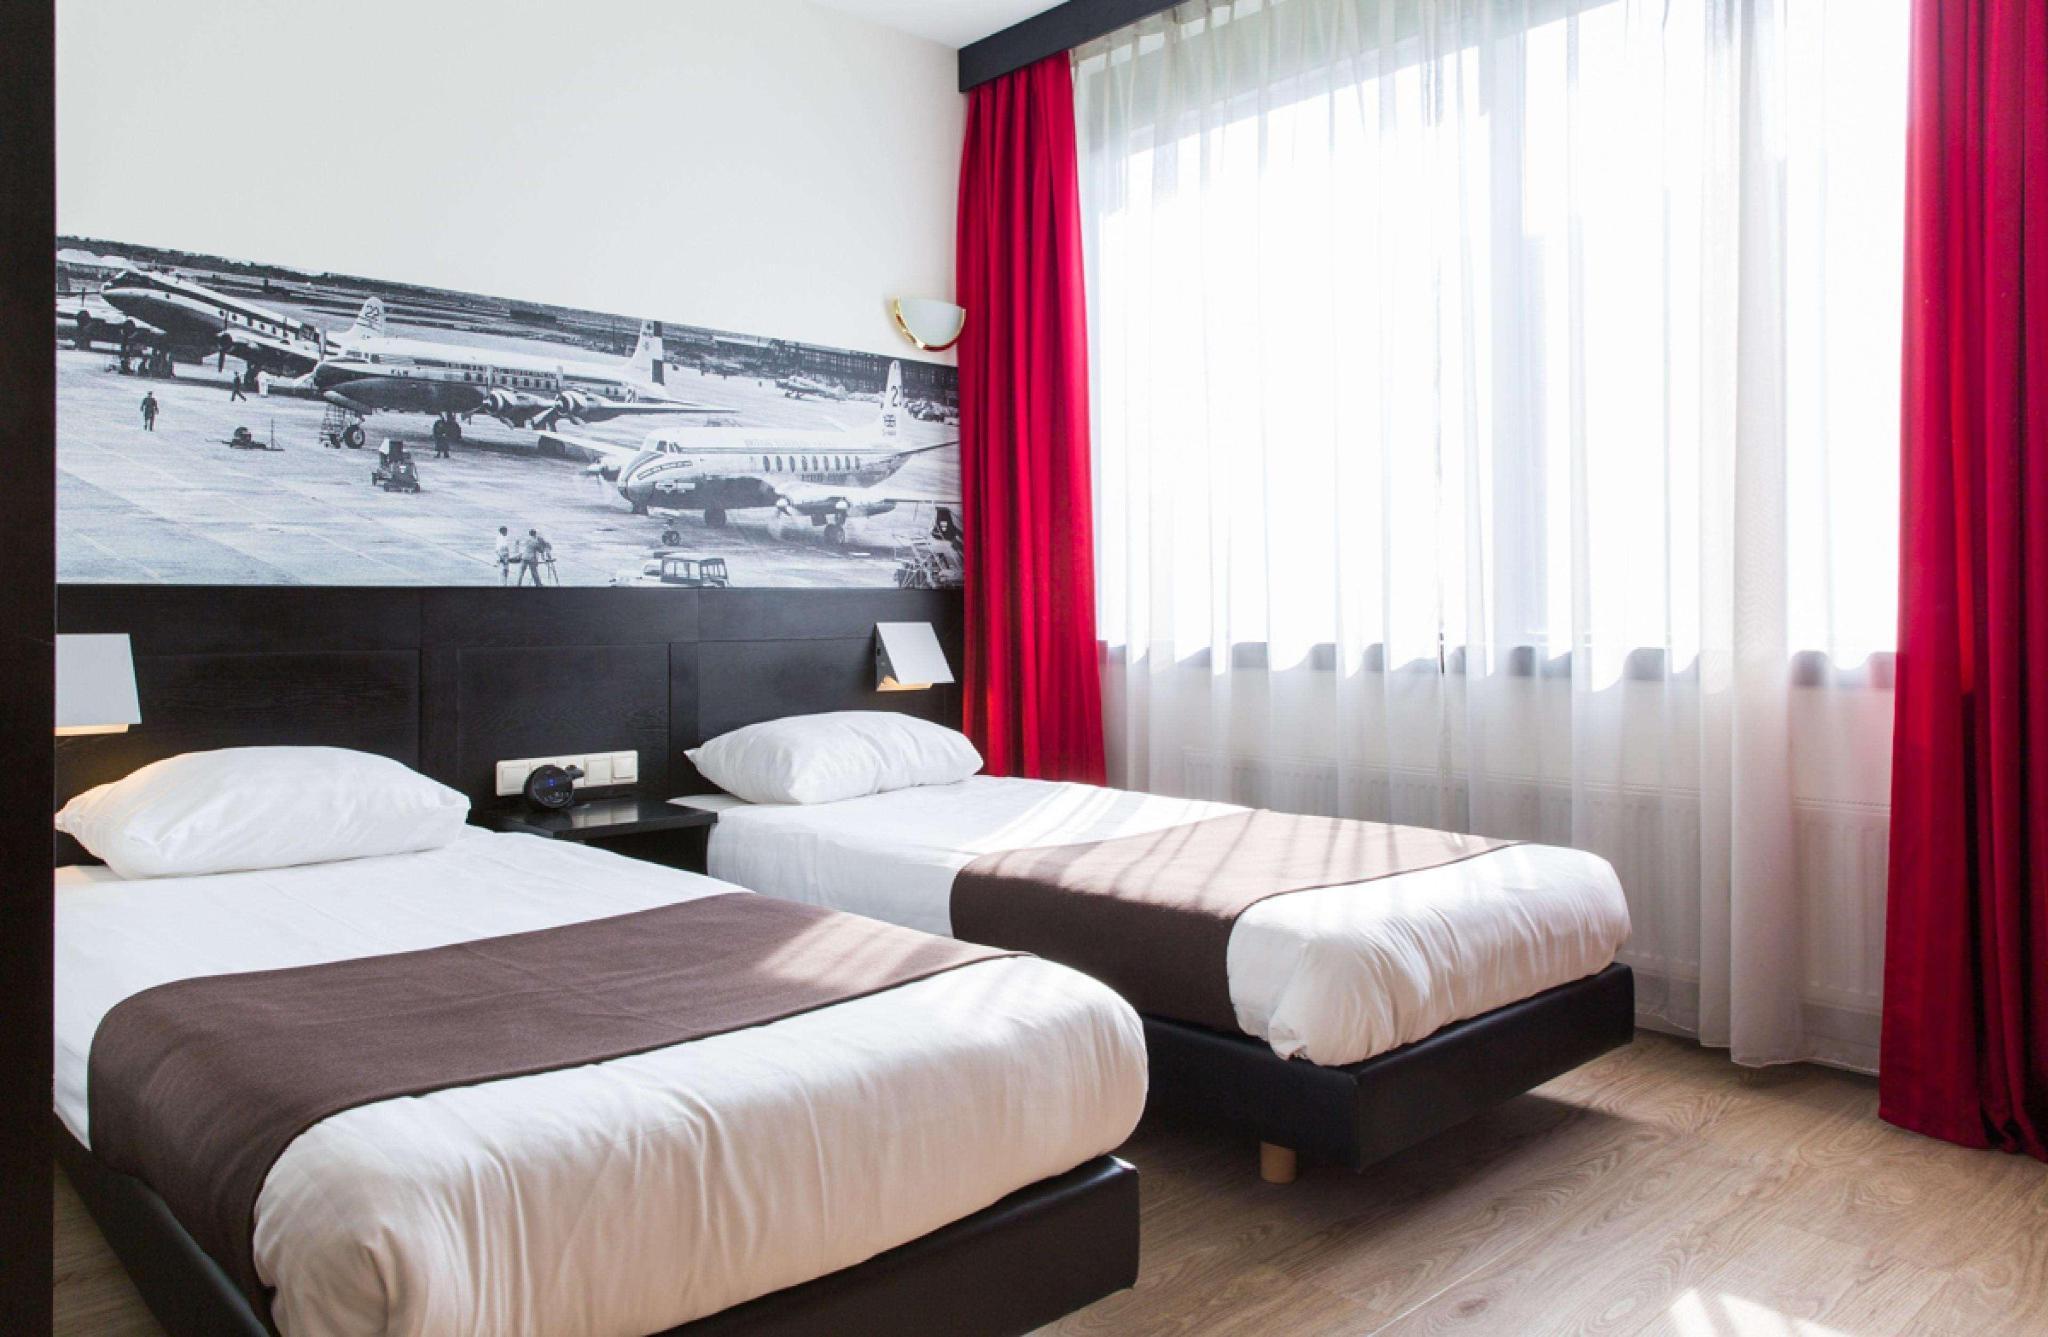 Quadruple three beds